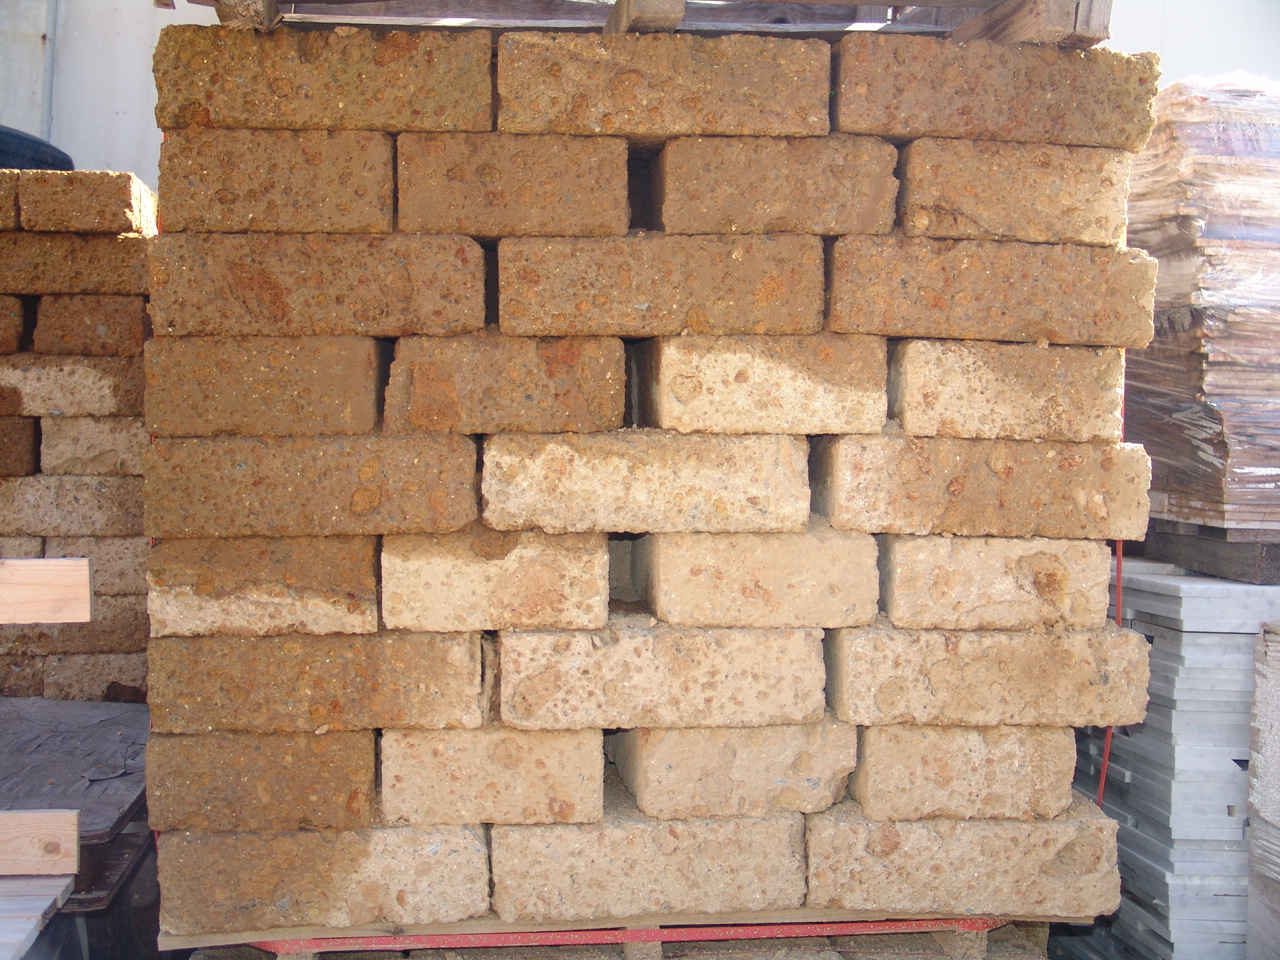 Zem enrico marmi prezzi sassi rivestimento muri super - Mattoni da esterno prezzi ...